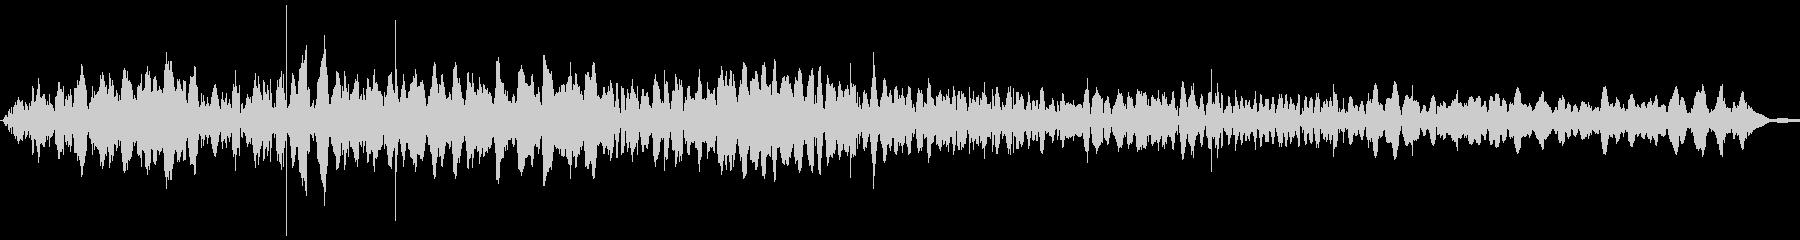 SciFi EC01_89_2の未再生の波形